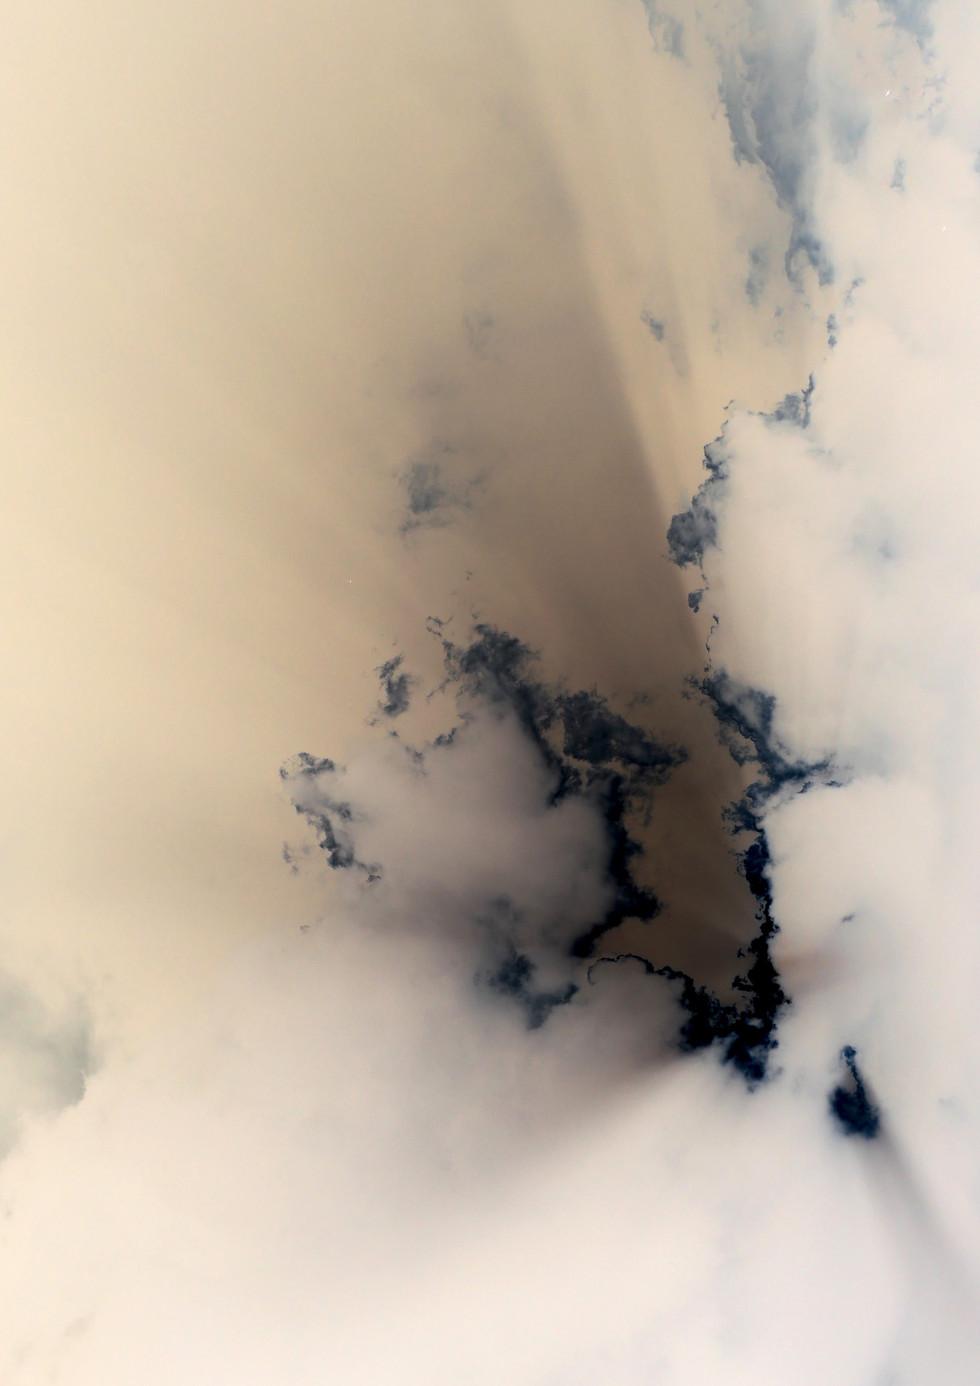 Clamshell Cloud no.3